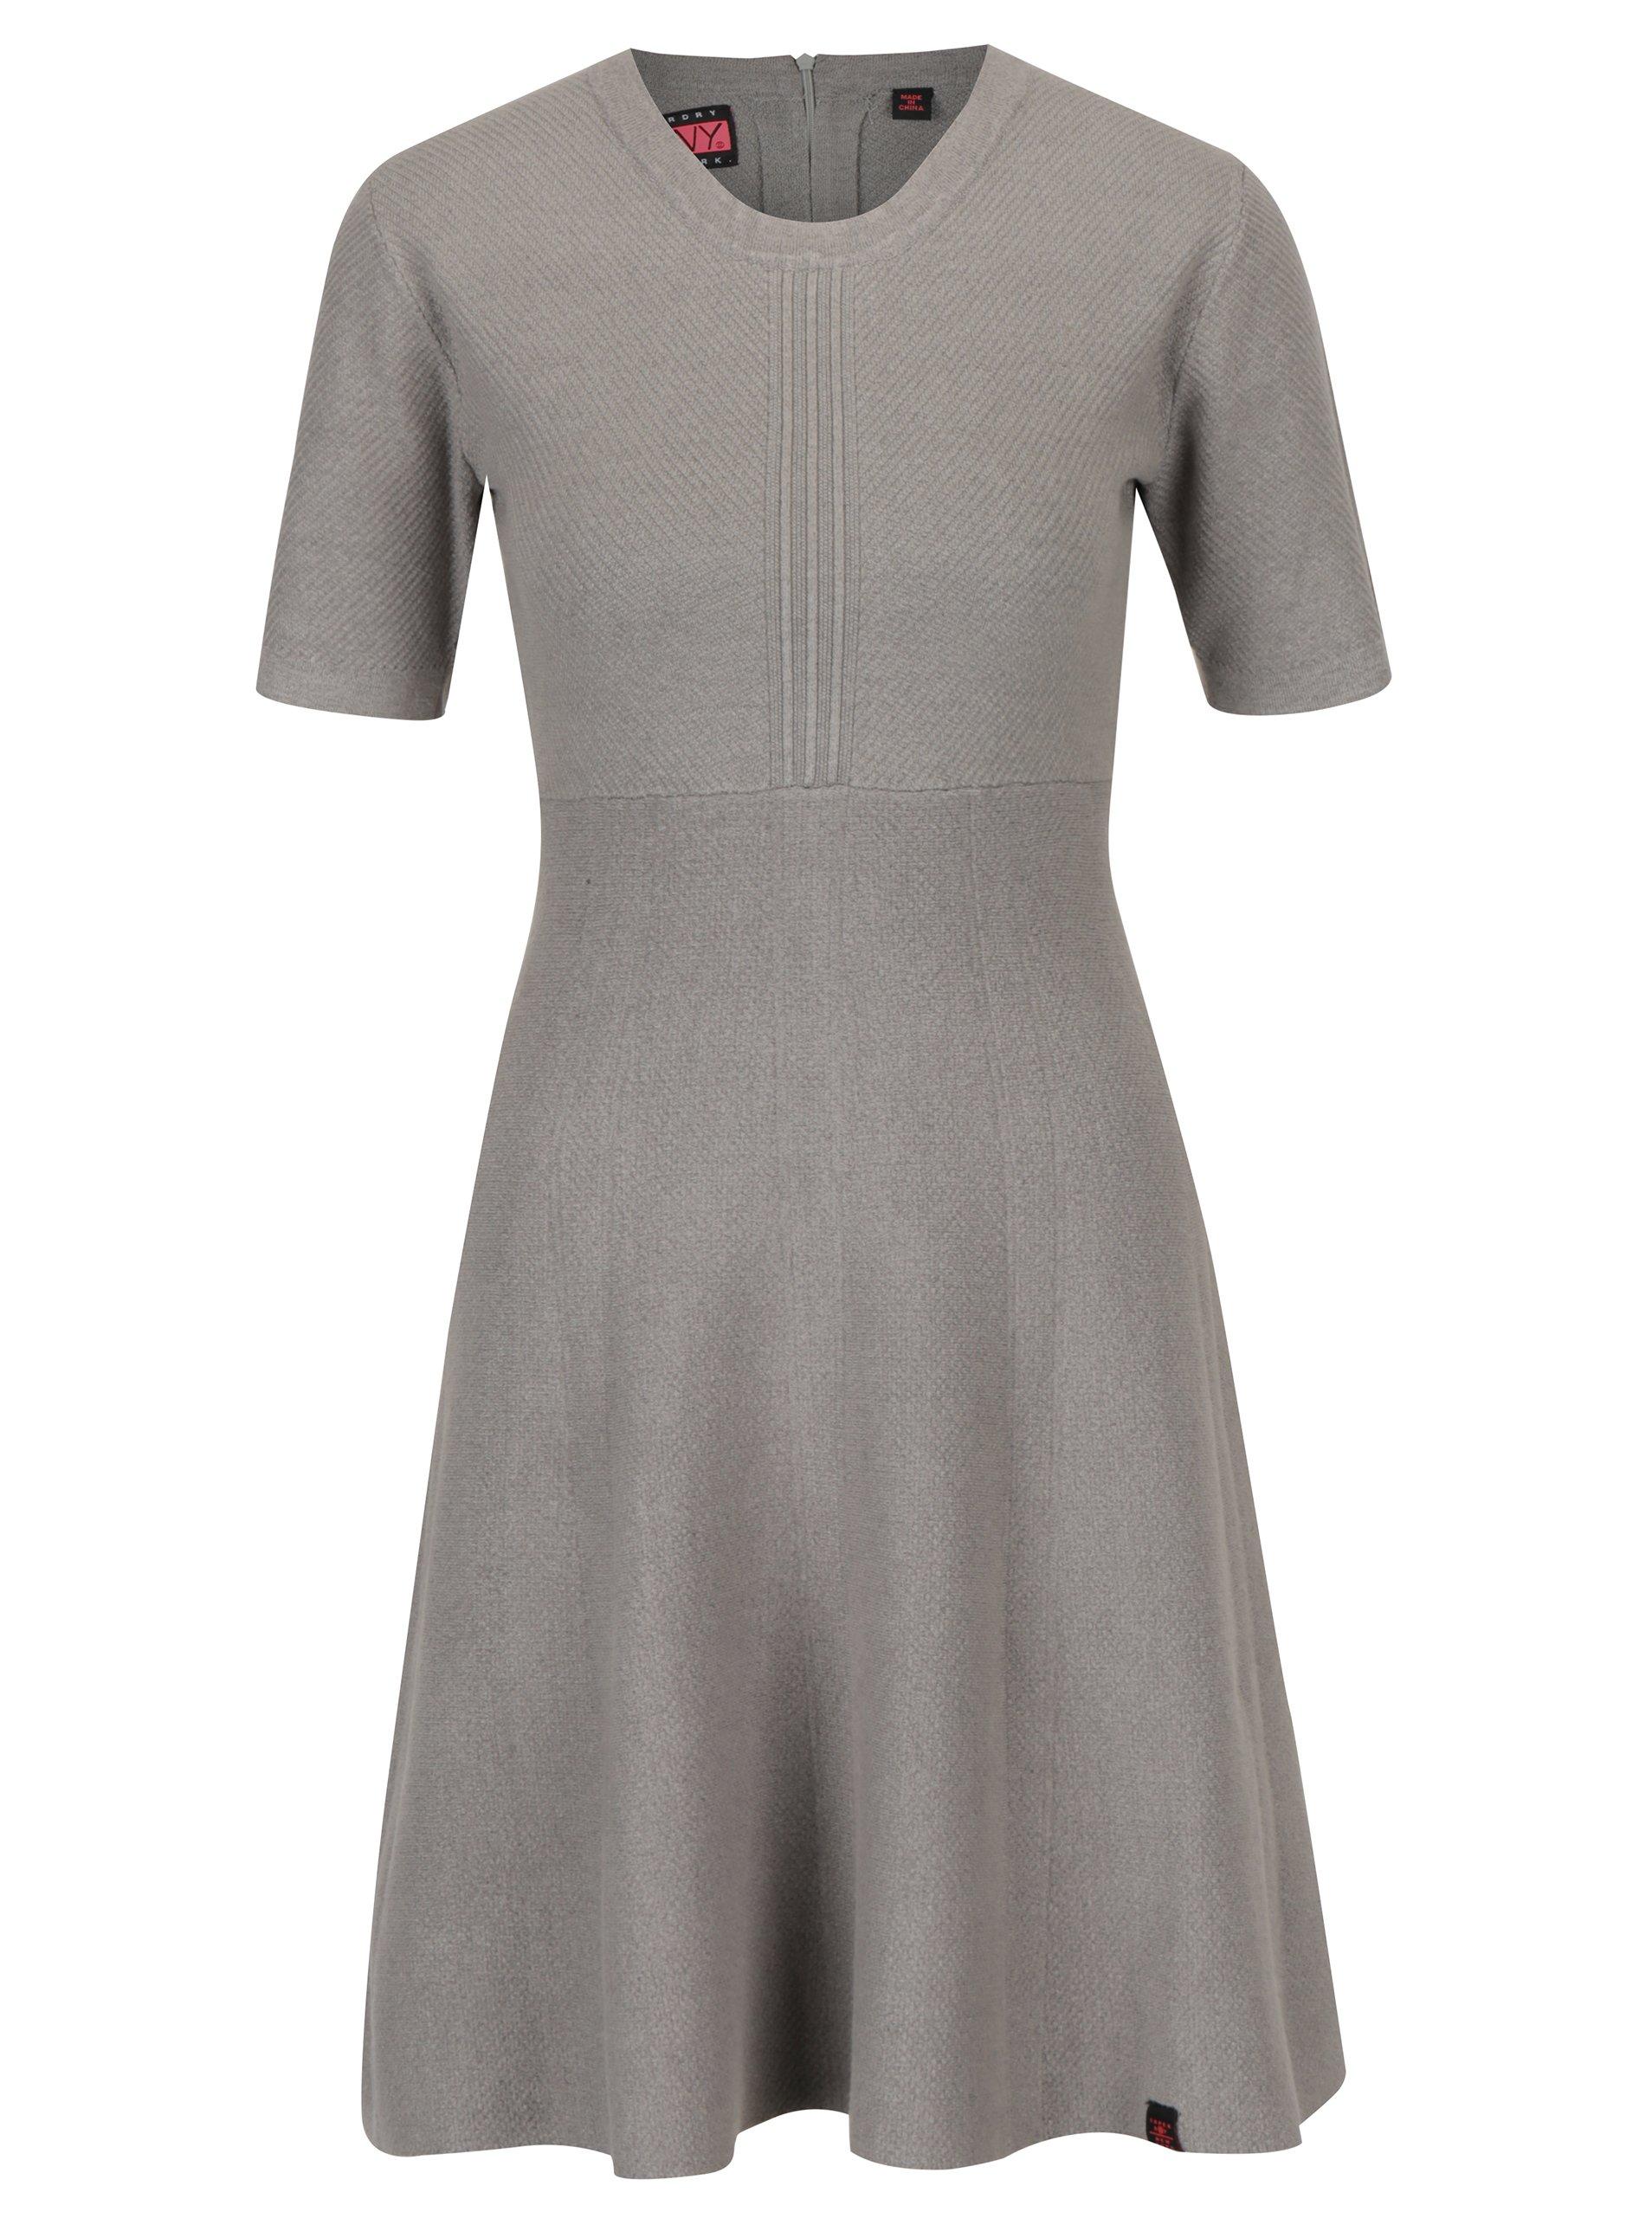 130ff51d5369 Sivé svetrové šaty Superdry Lexi